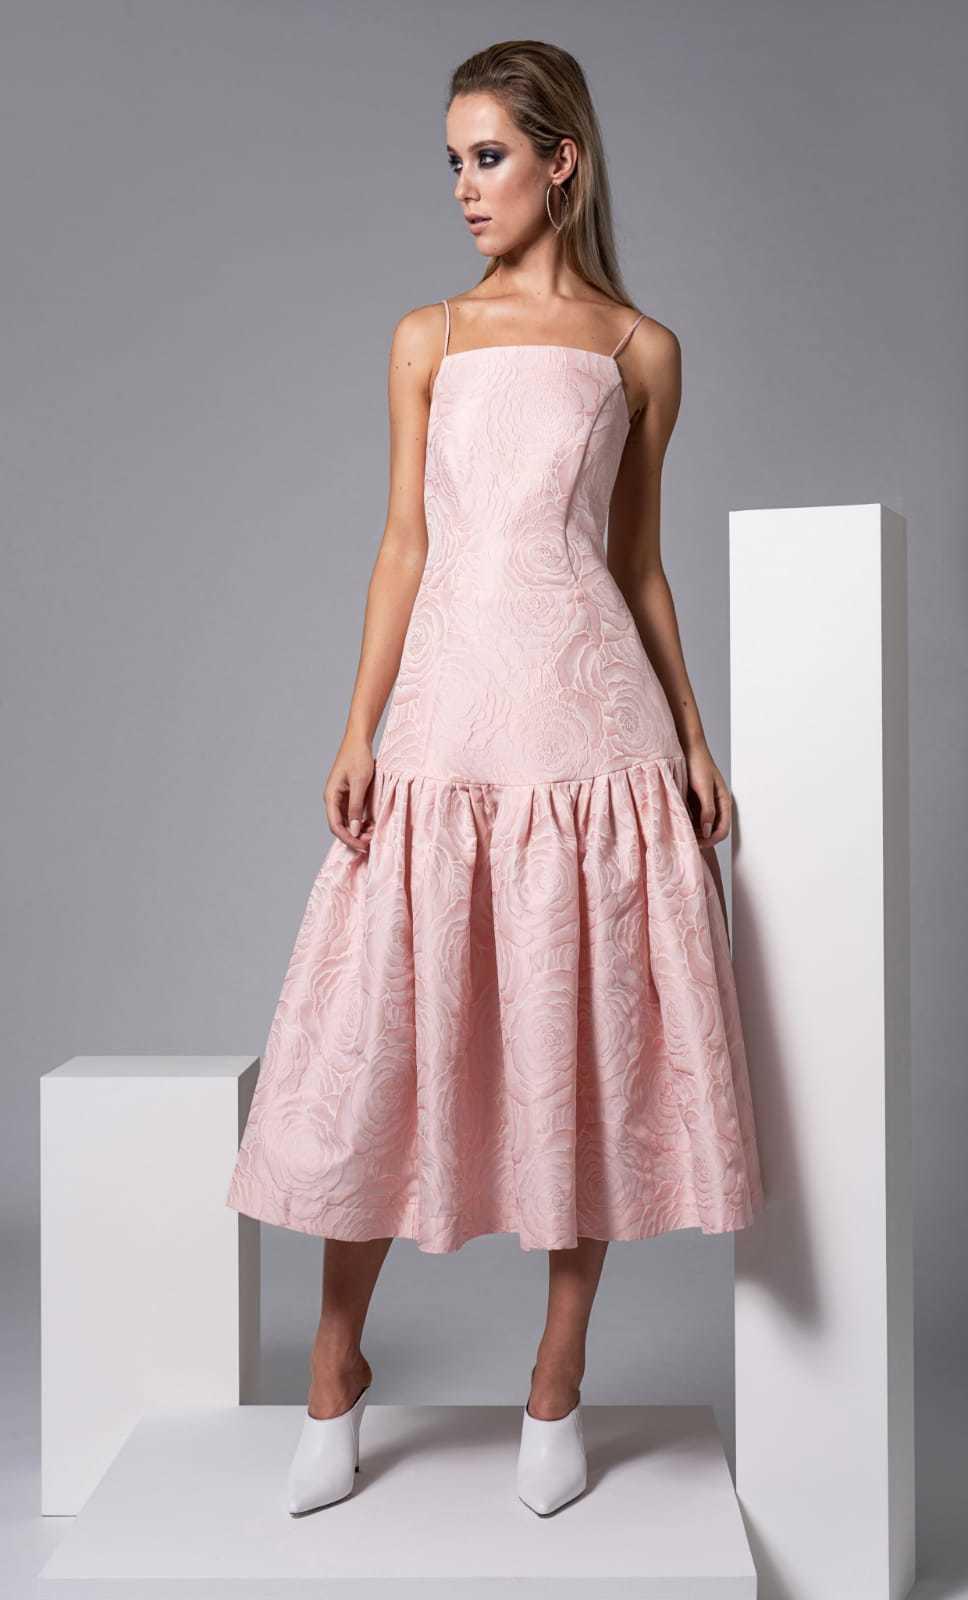 Harris Dress in Pale Pink Floral Embossed Fabric CARKKSISHARRIS